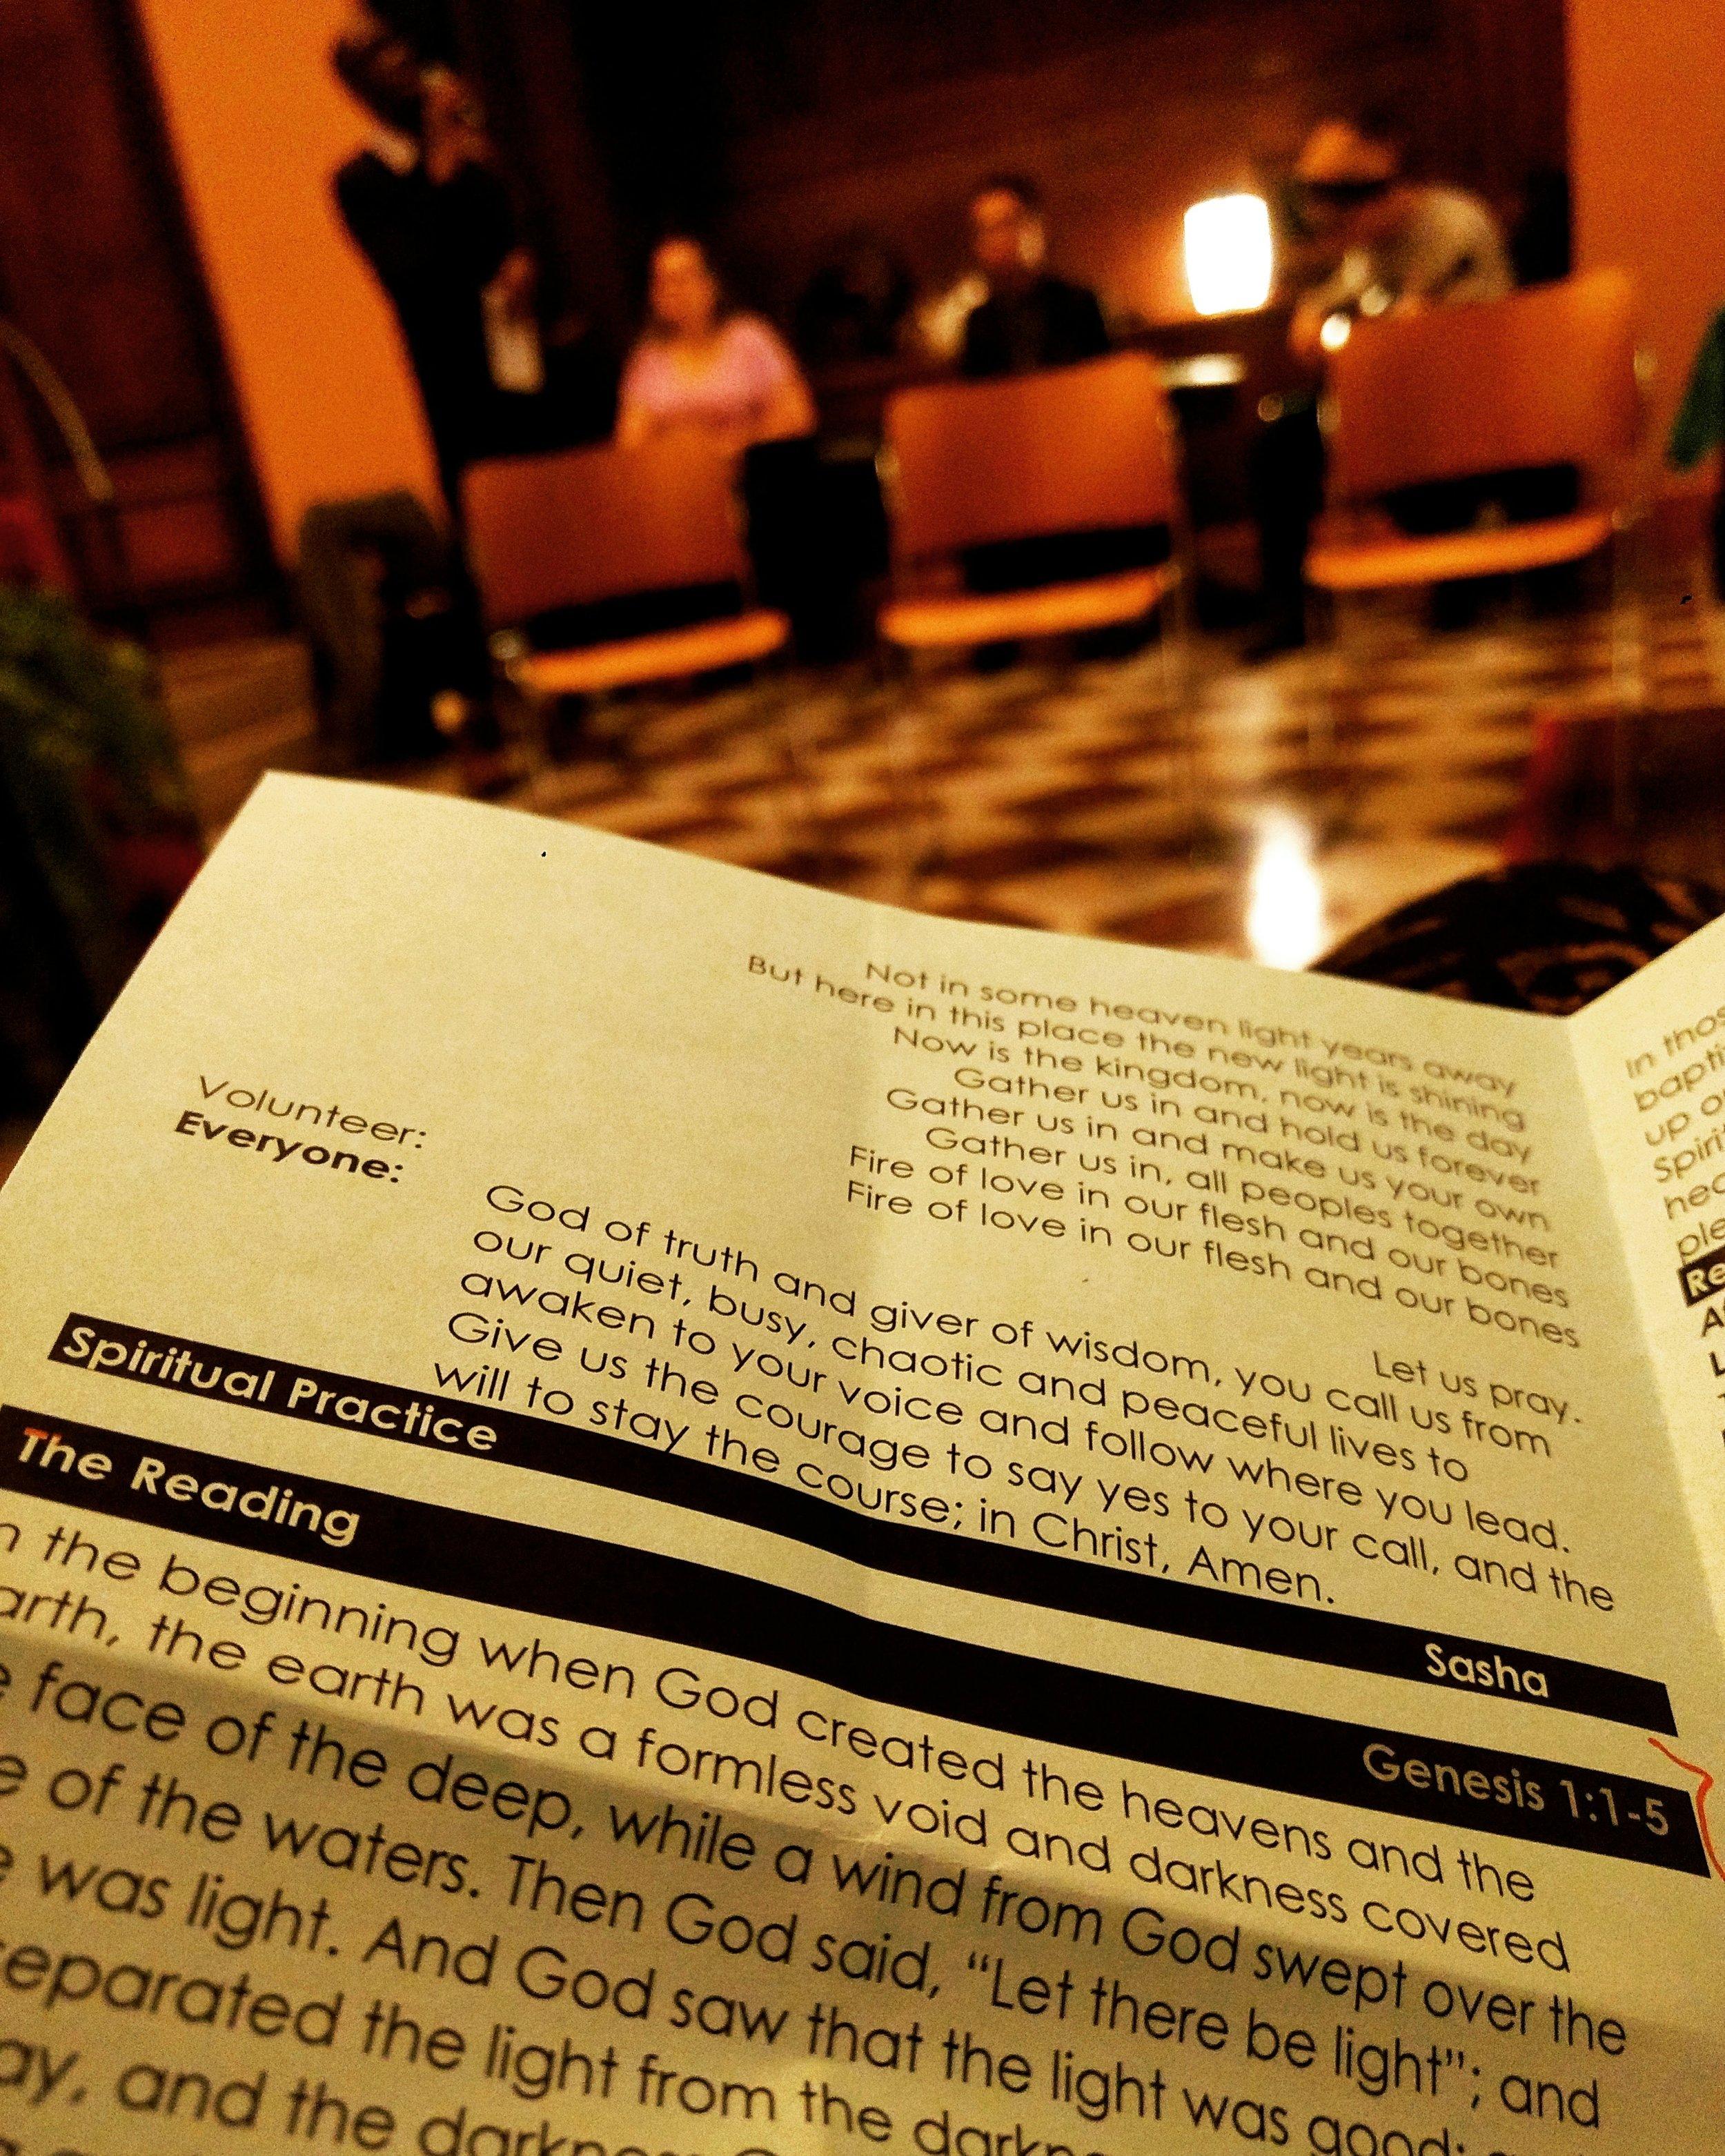 The Crossing worship sheet pic.jpg